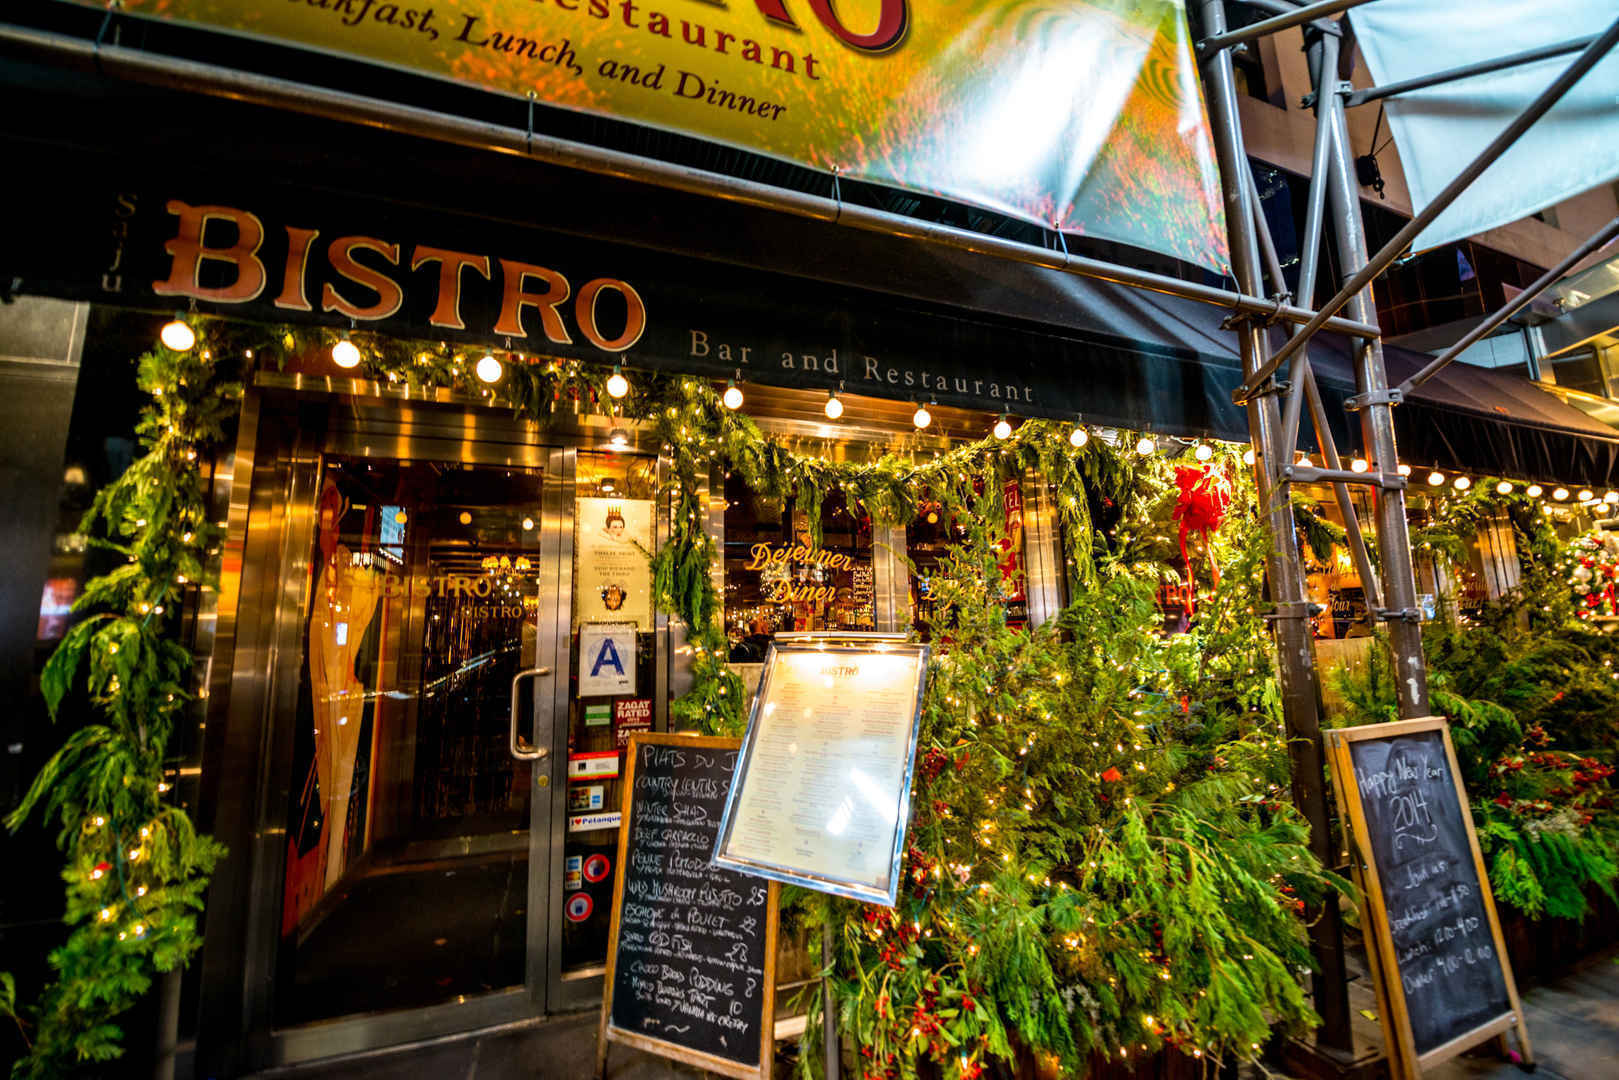 Saju Bistro in the Theater District, Manhattan, New York